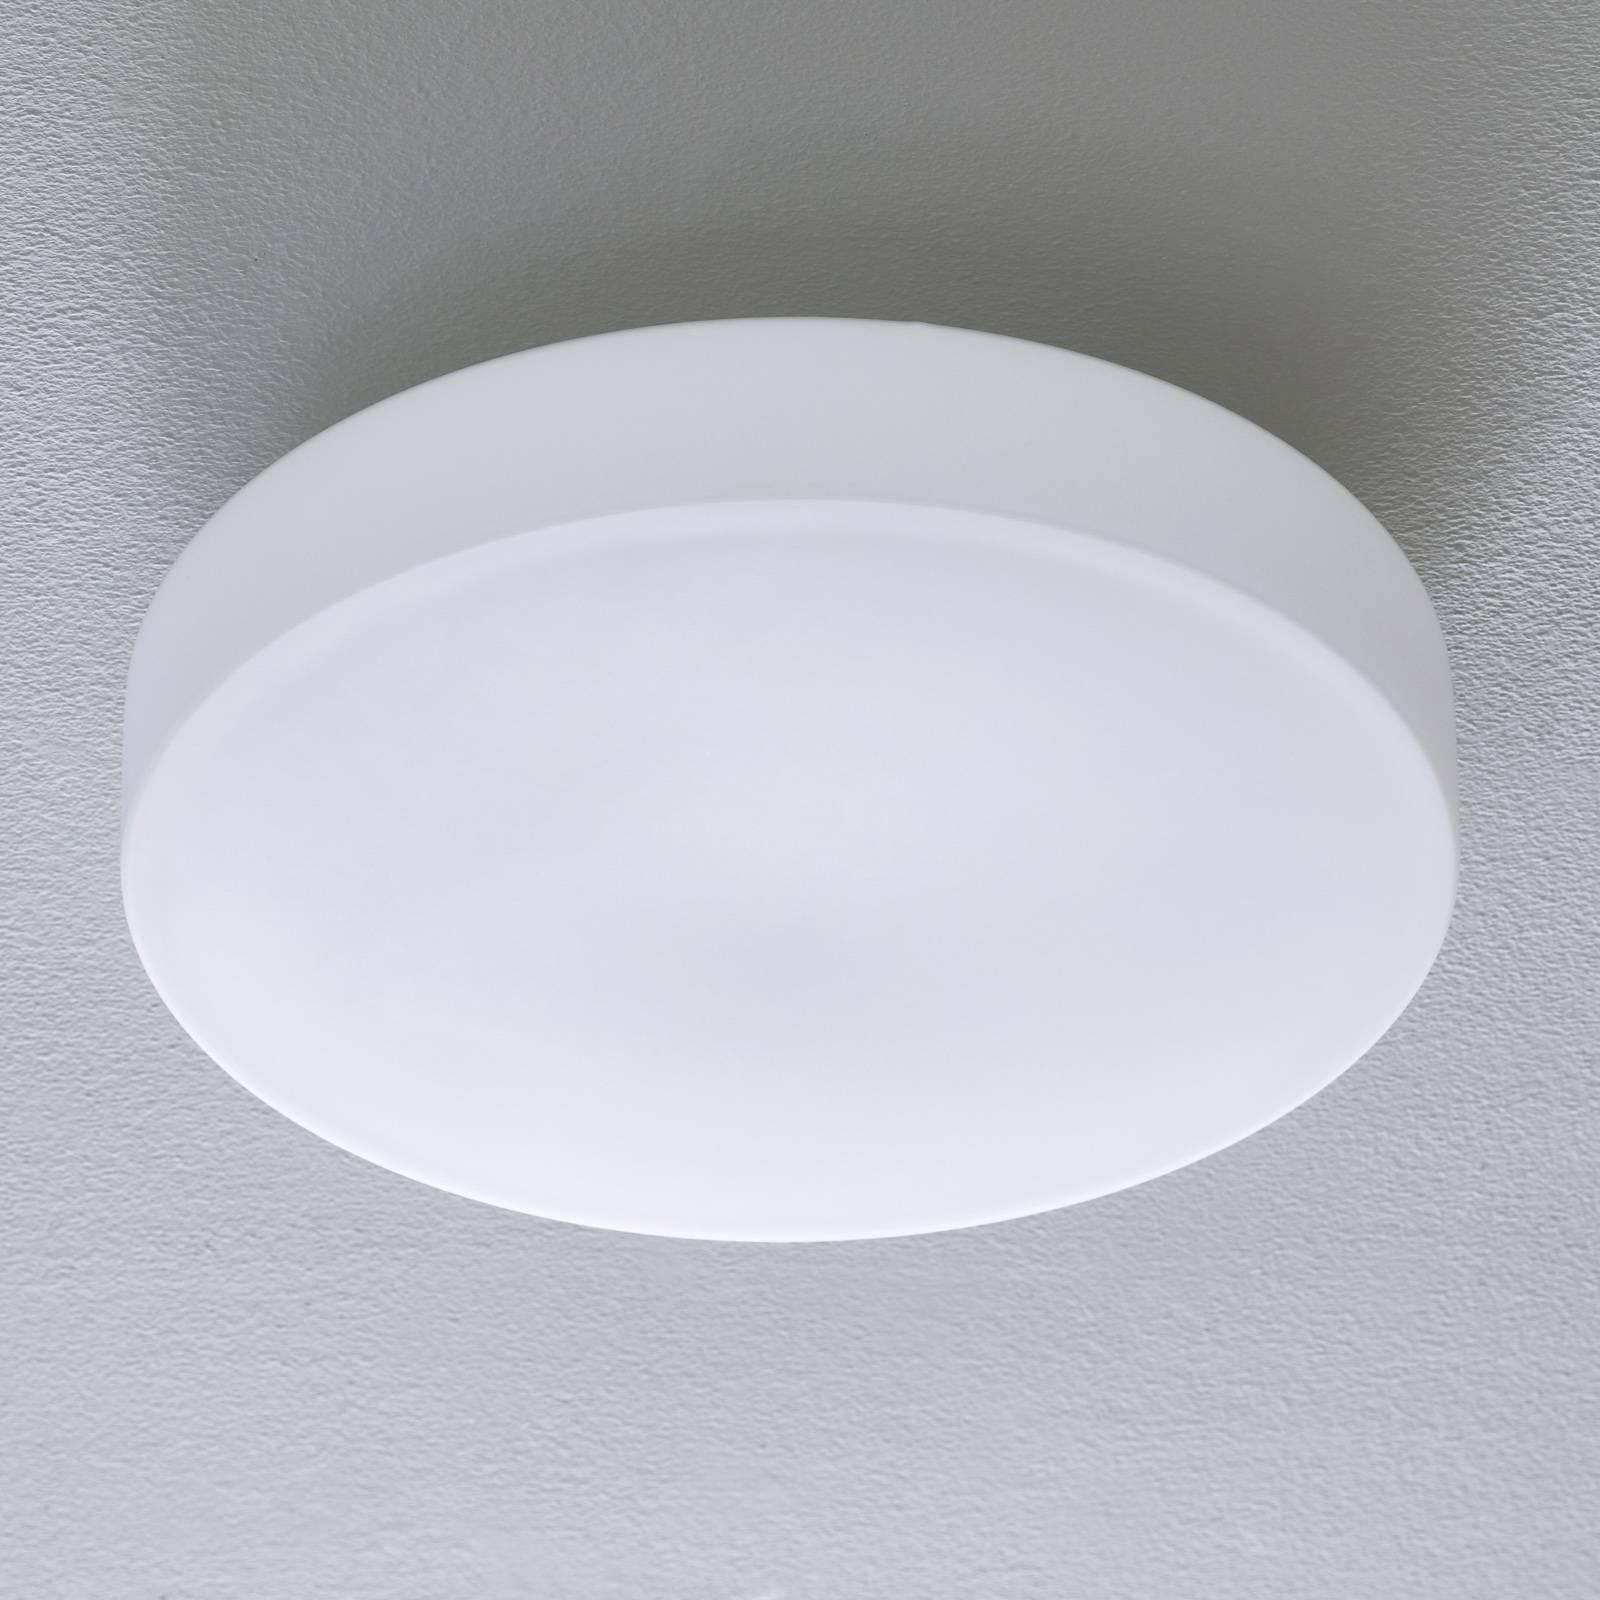 BEGA 50652 LED-kattovalo opaalilasi 3000K Ø39cm